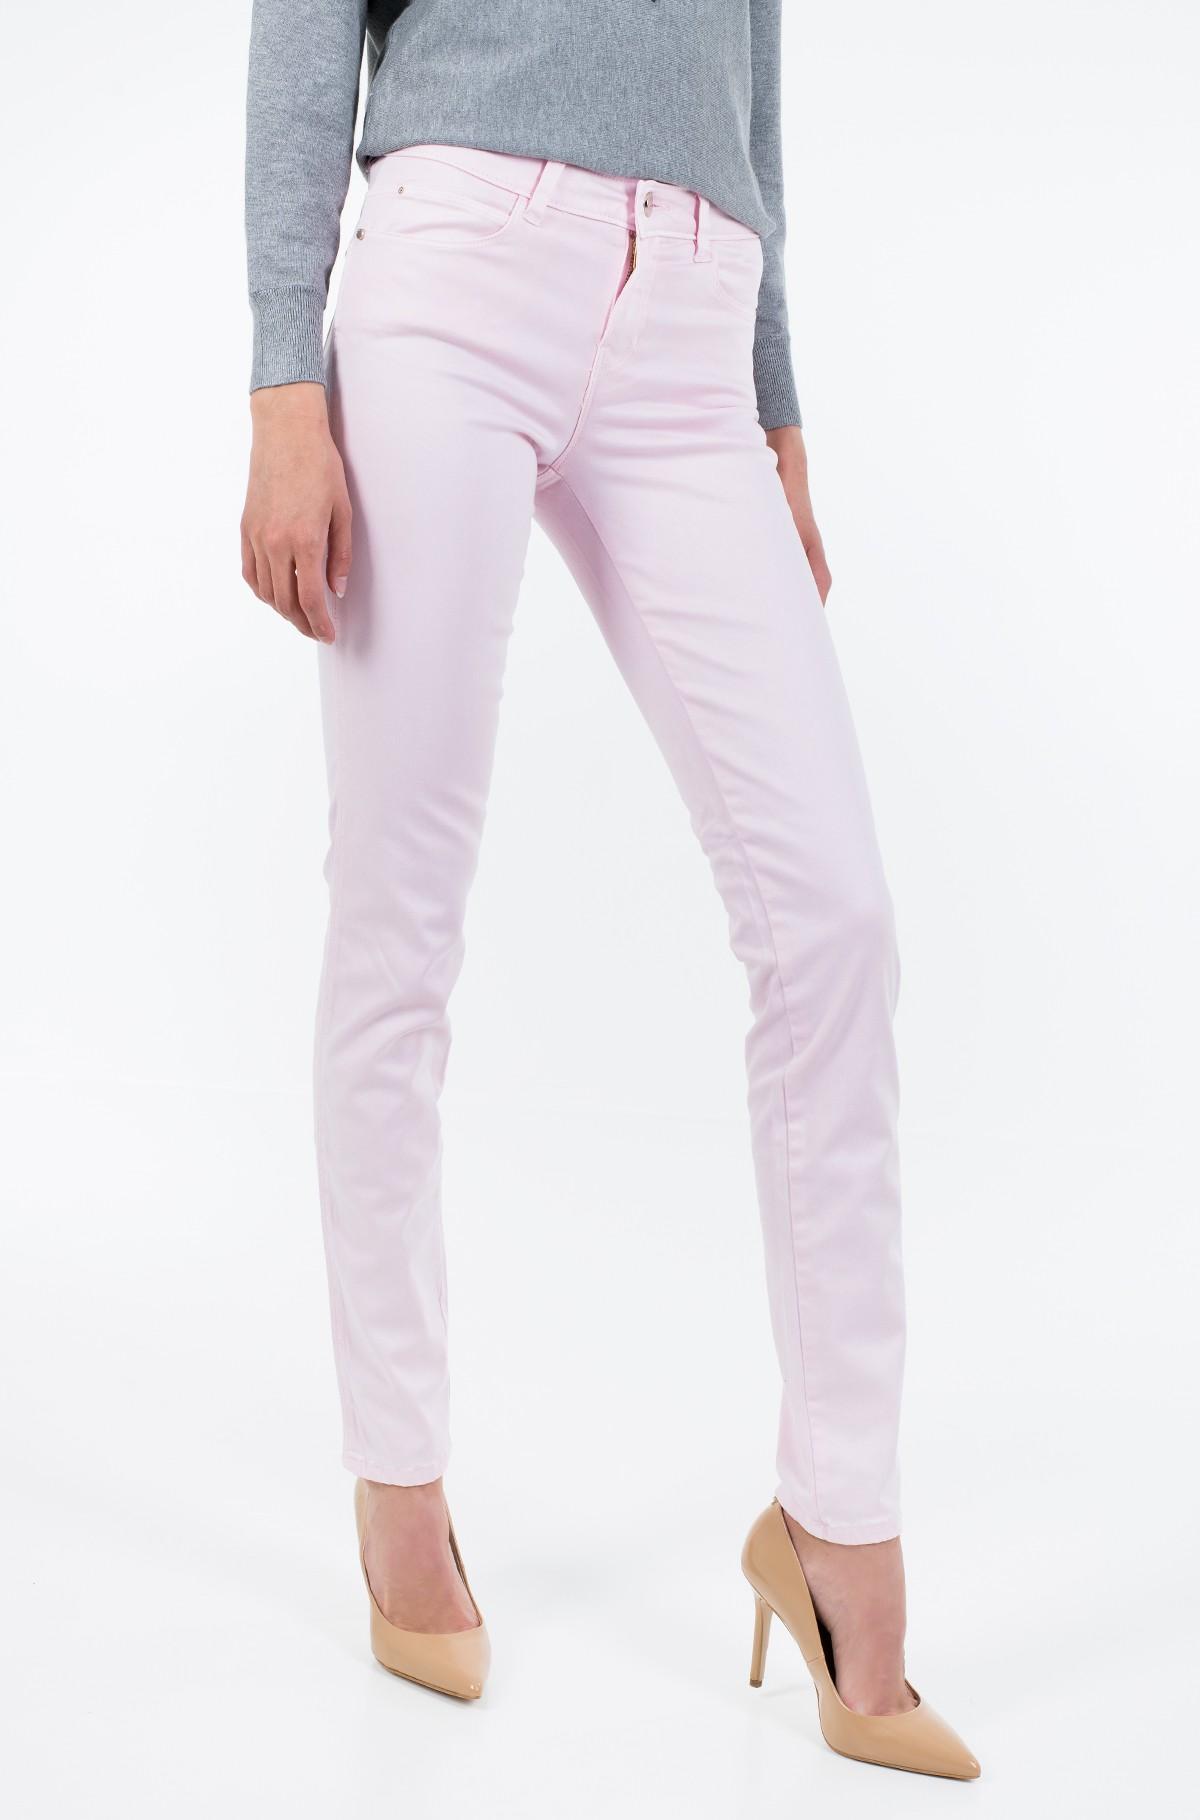 Jeans W02AJ2 W93C6-full-1